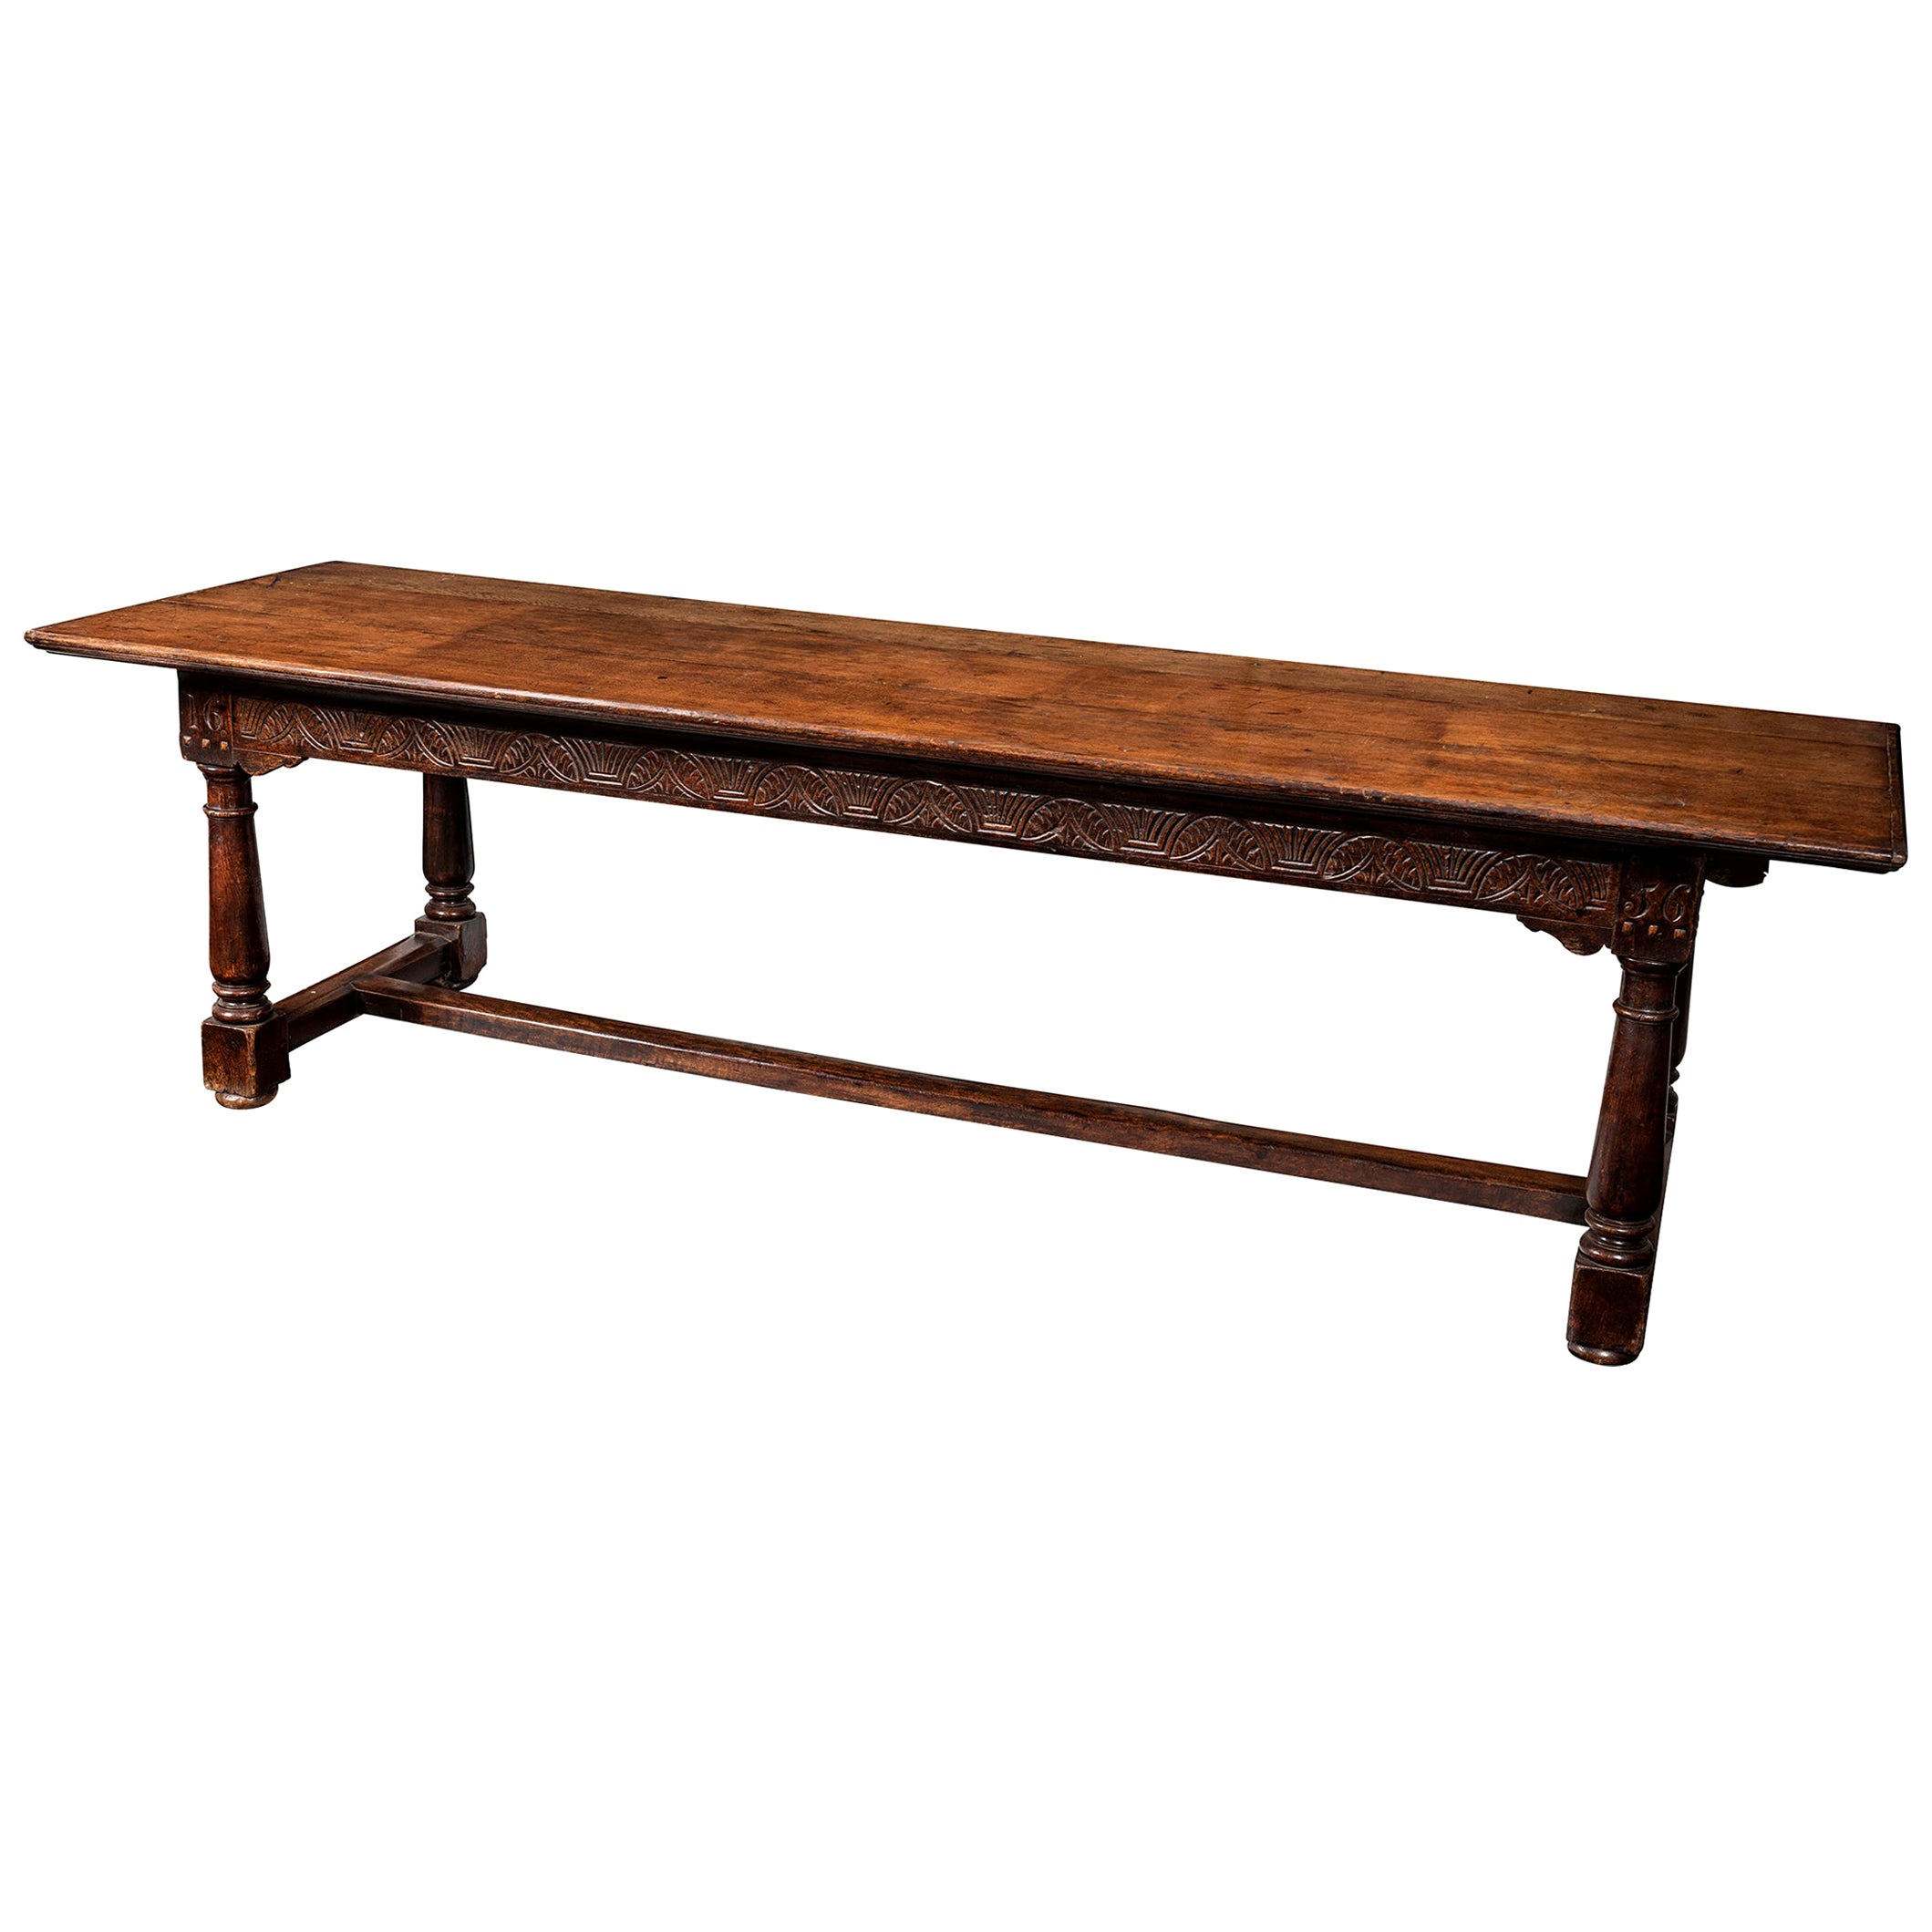 English Cromwellian Oak Refectory Table, 17th Century